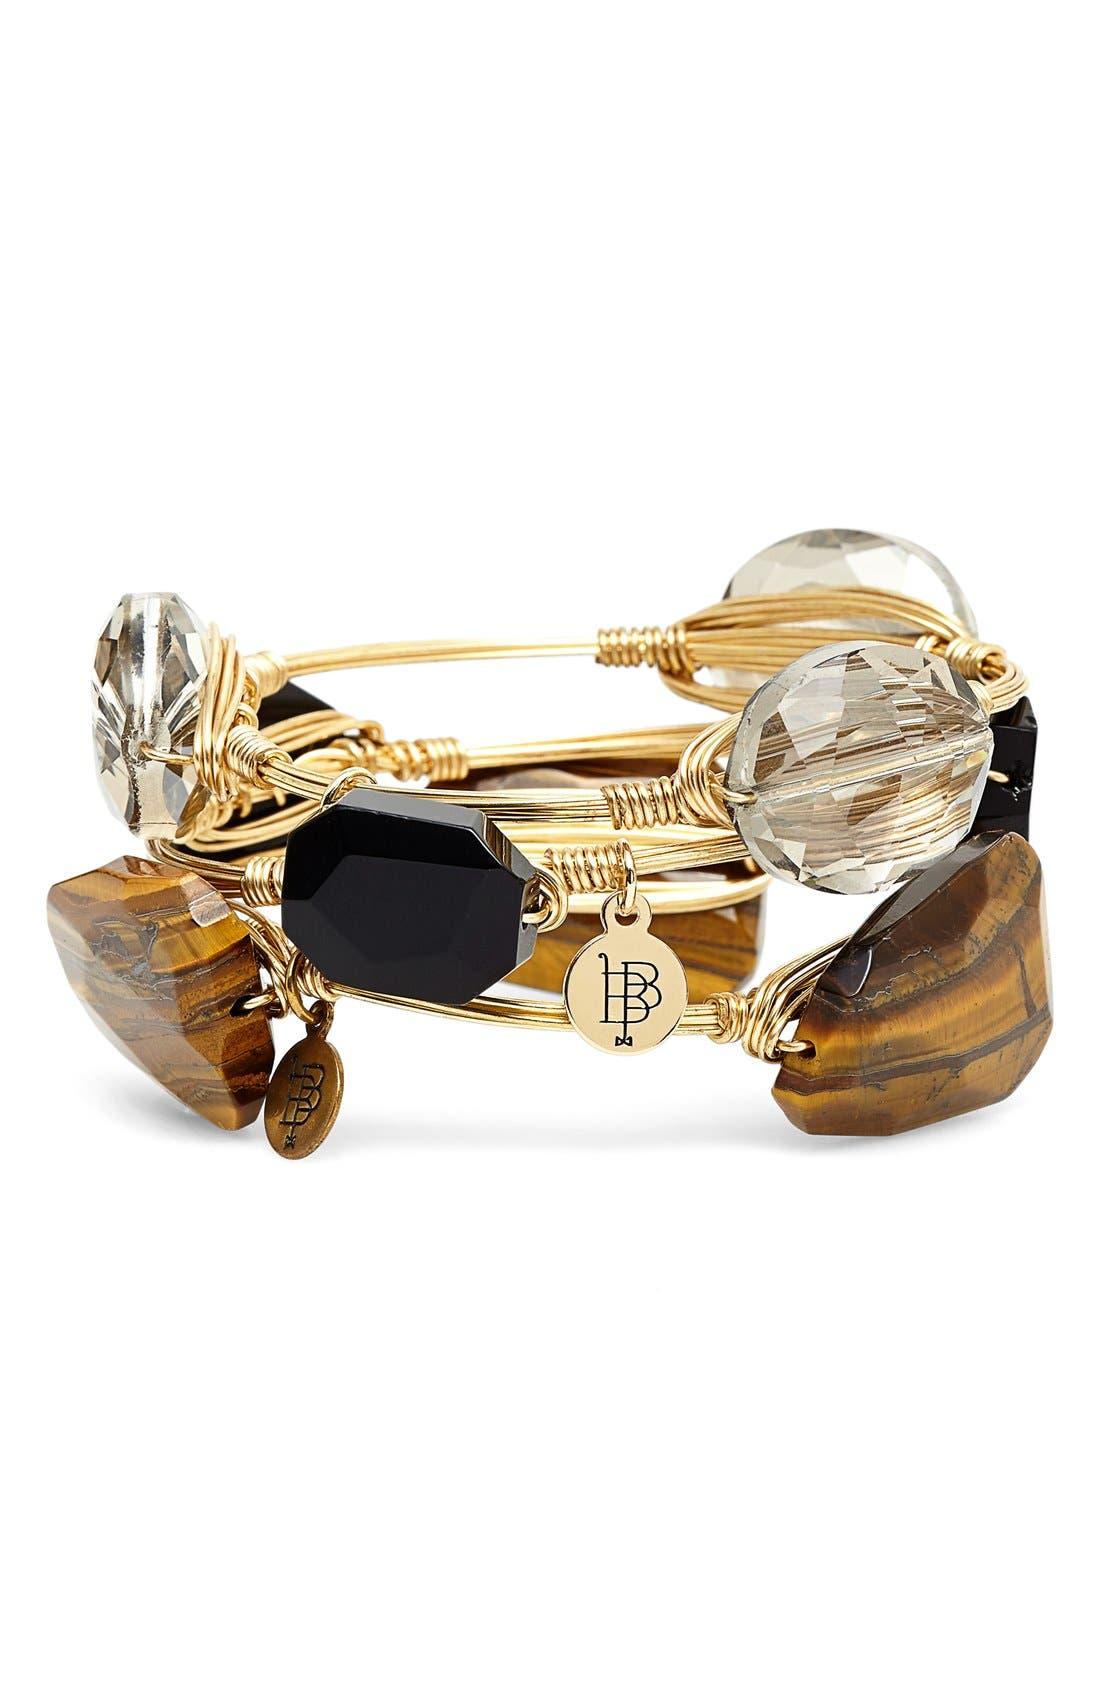 'Tiger's Eye Agate & Jet Acrylic Crystal' Stone Bracelets,                             Alternate thumbnail 3, color,                             200